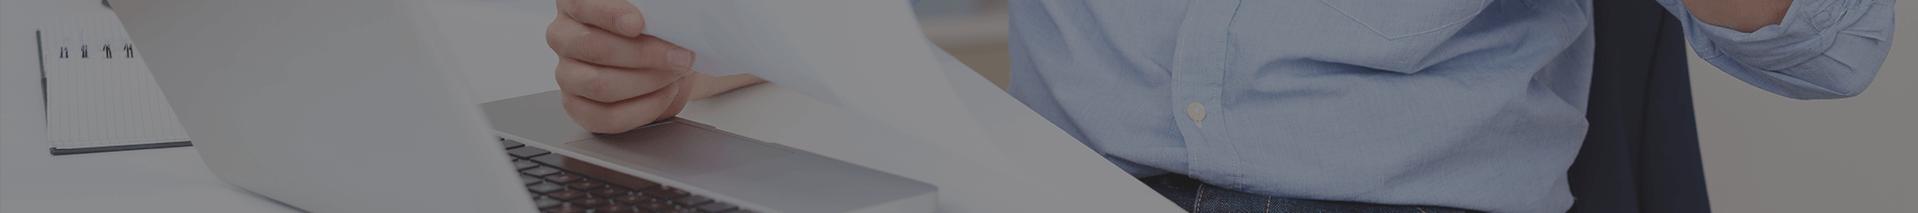 Kontakt z firmą Integra Software